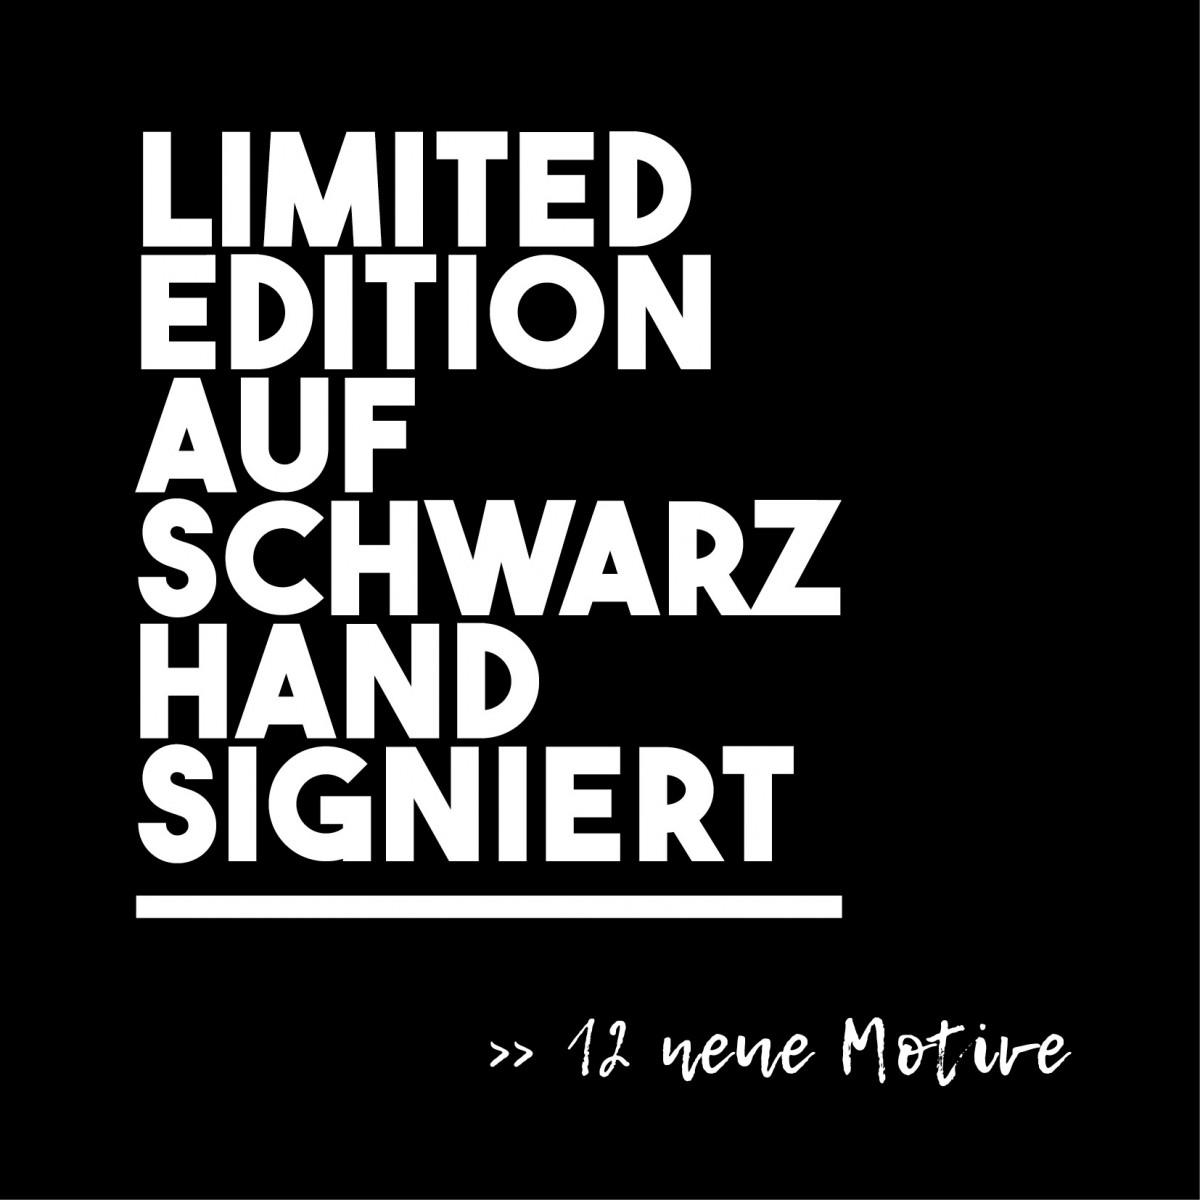 FrankfurterBubb CINEMA Limited Edition  schwarz-weiß Foto-Kachel